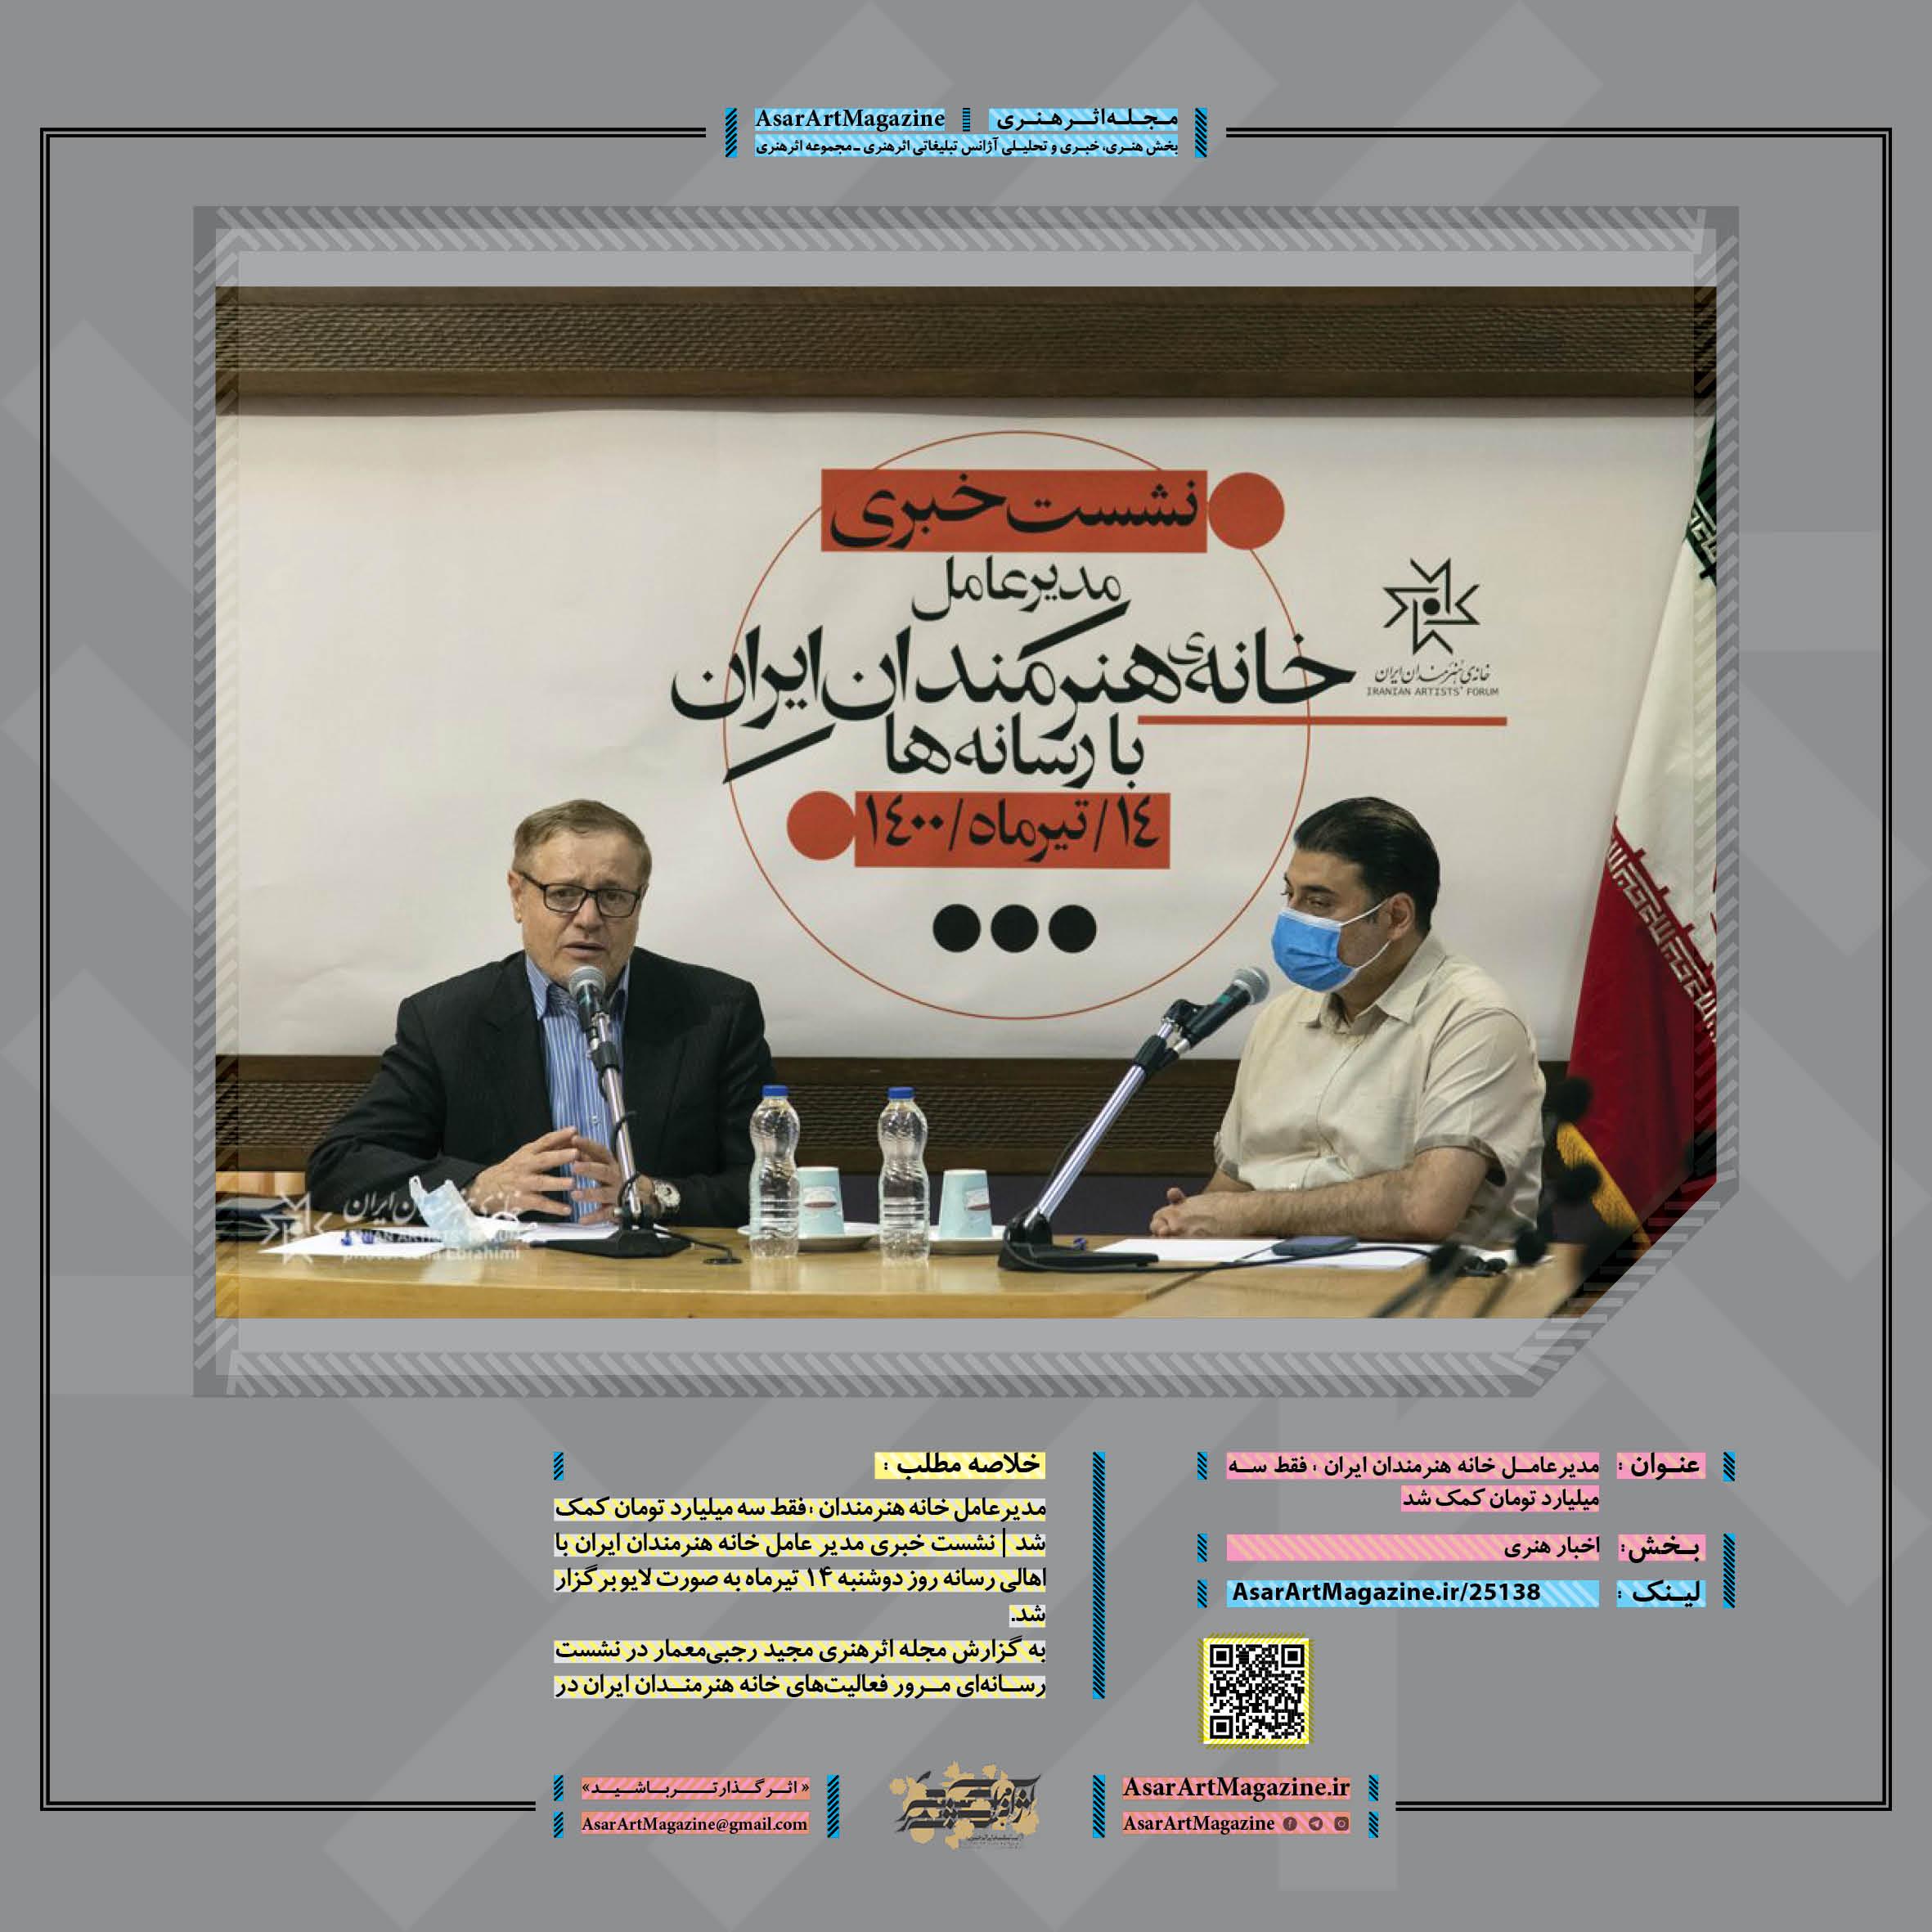 مدیرعامل خانه هنرمندان ایران : فقط سه میلیارد تومان کمک شد  مجله اثرهنری ـ اثر هنری